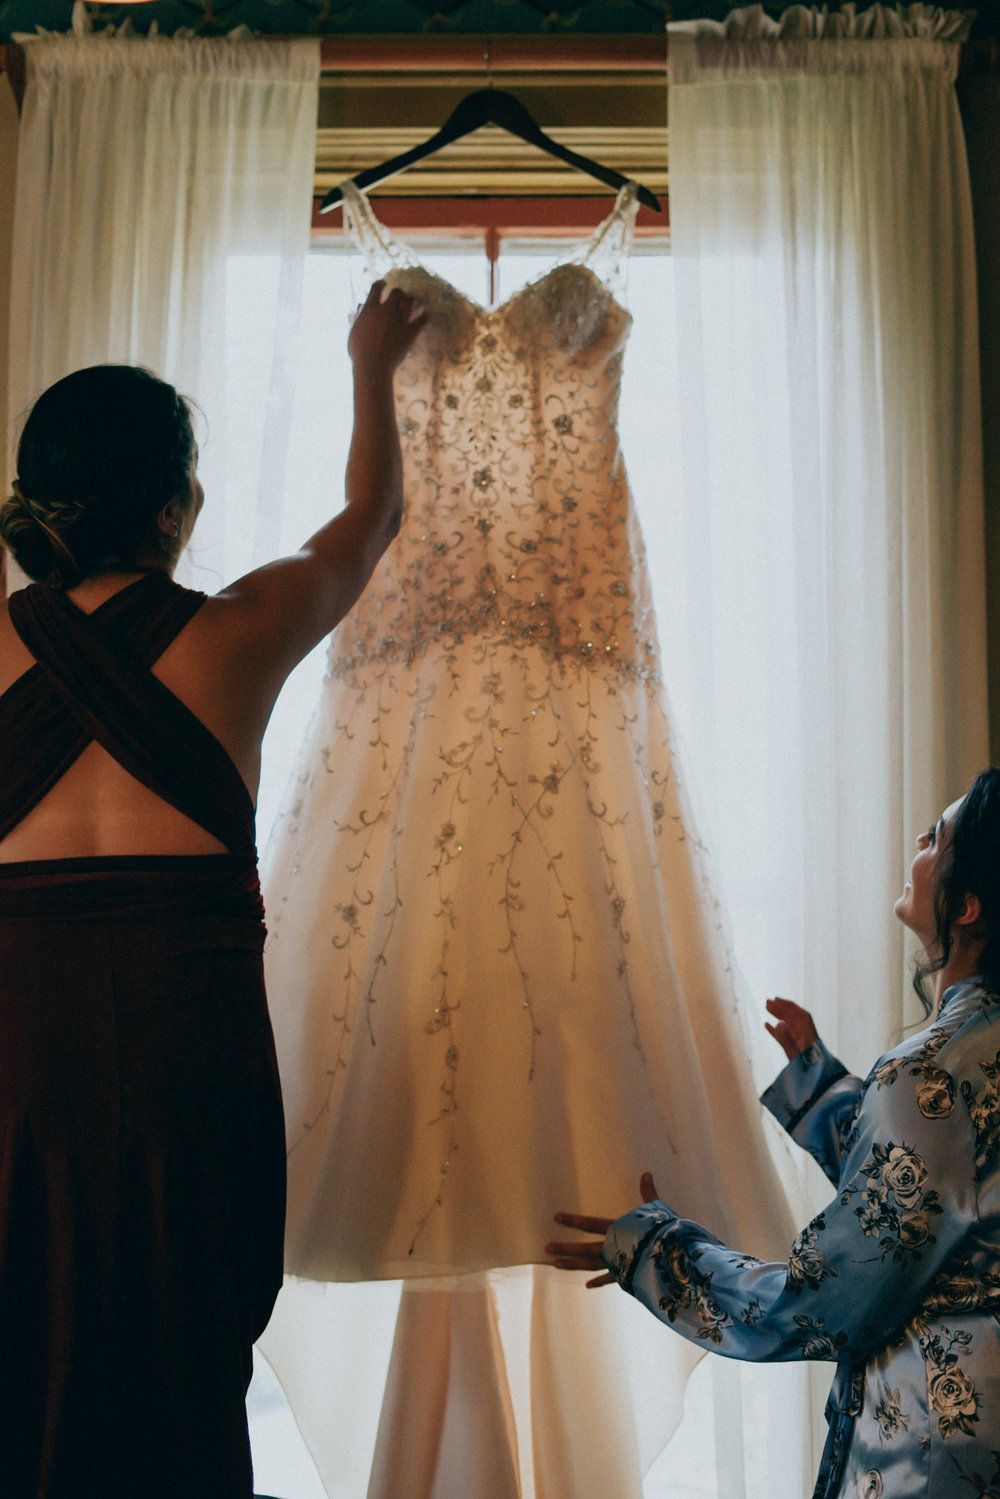 Portland_wedding_photographer_McMenamins_Alfred_Tang-29.jpg